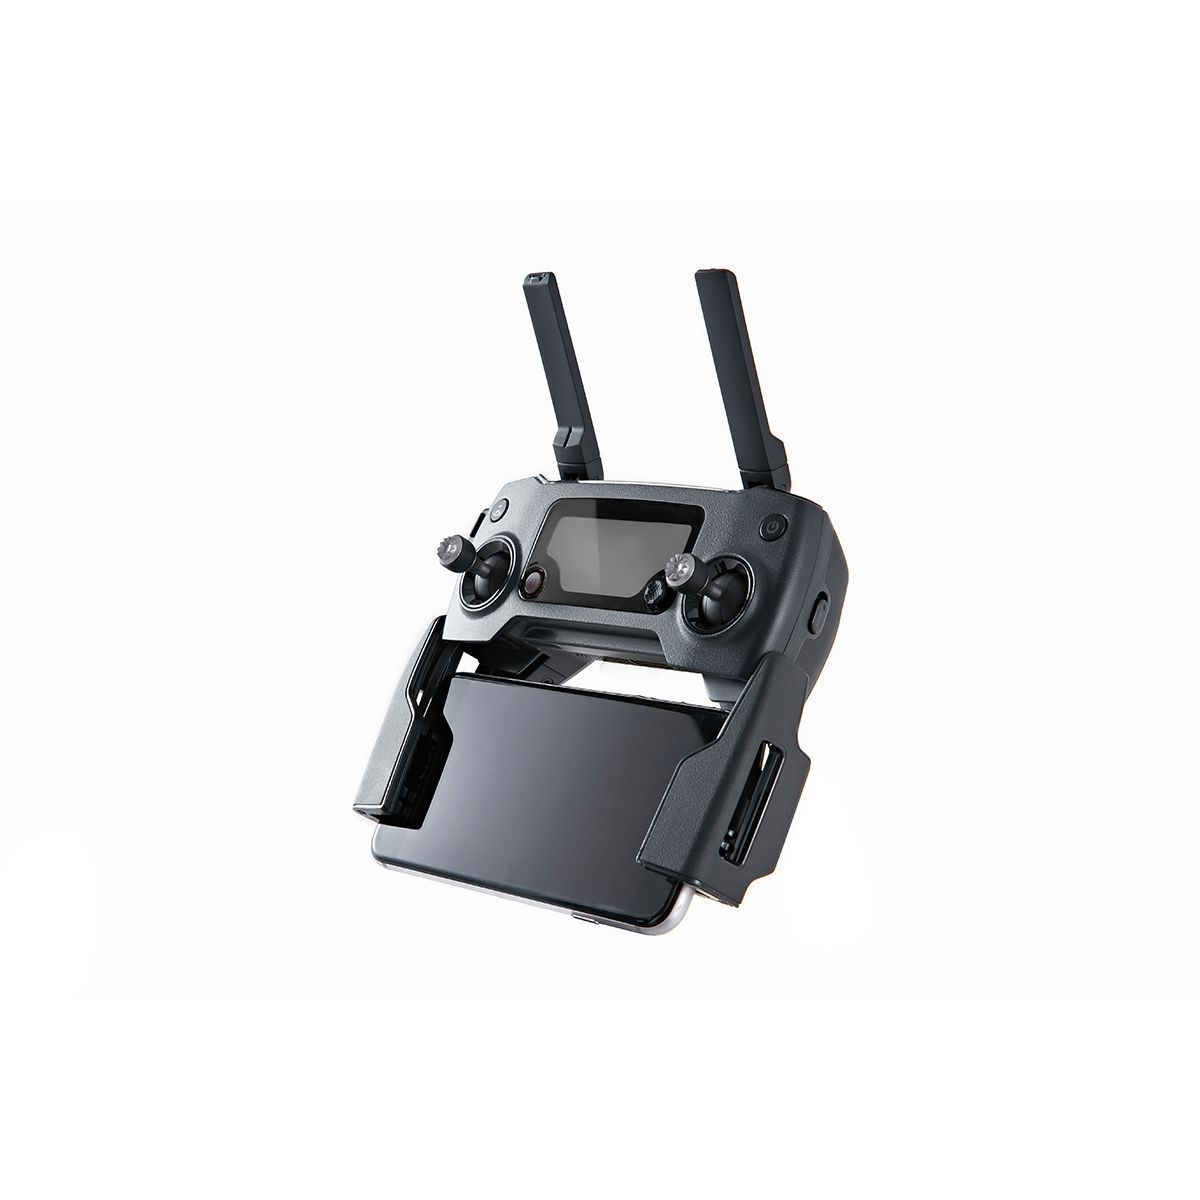 Drone DJI Mavic Pro Camera 4K C4K wifi controle remoto